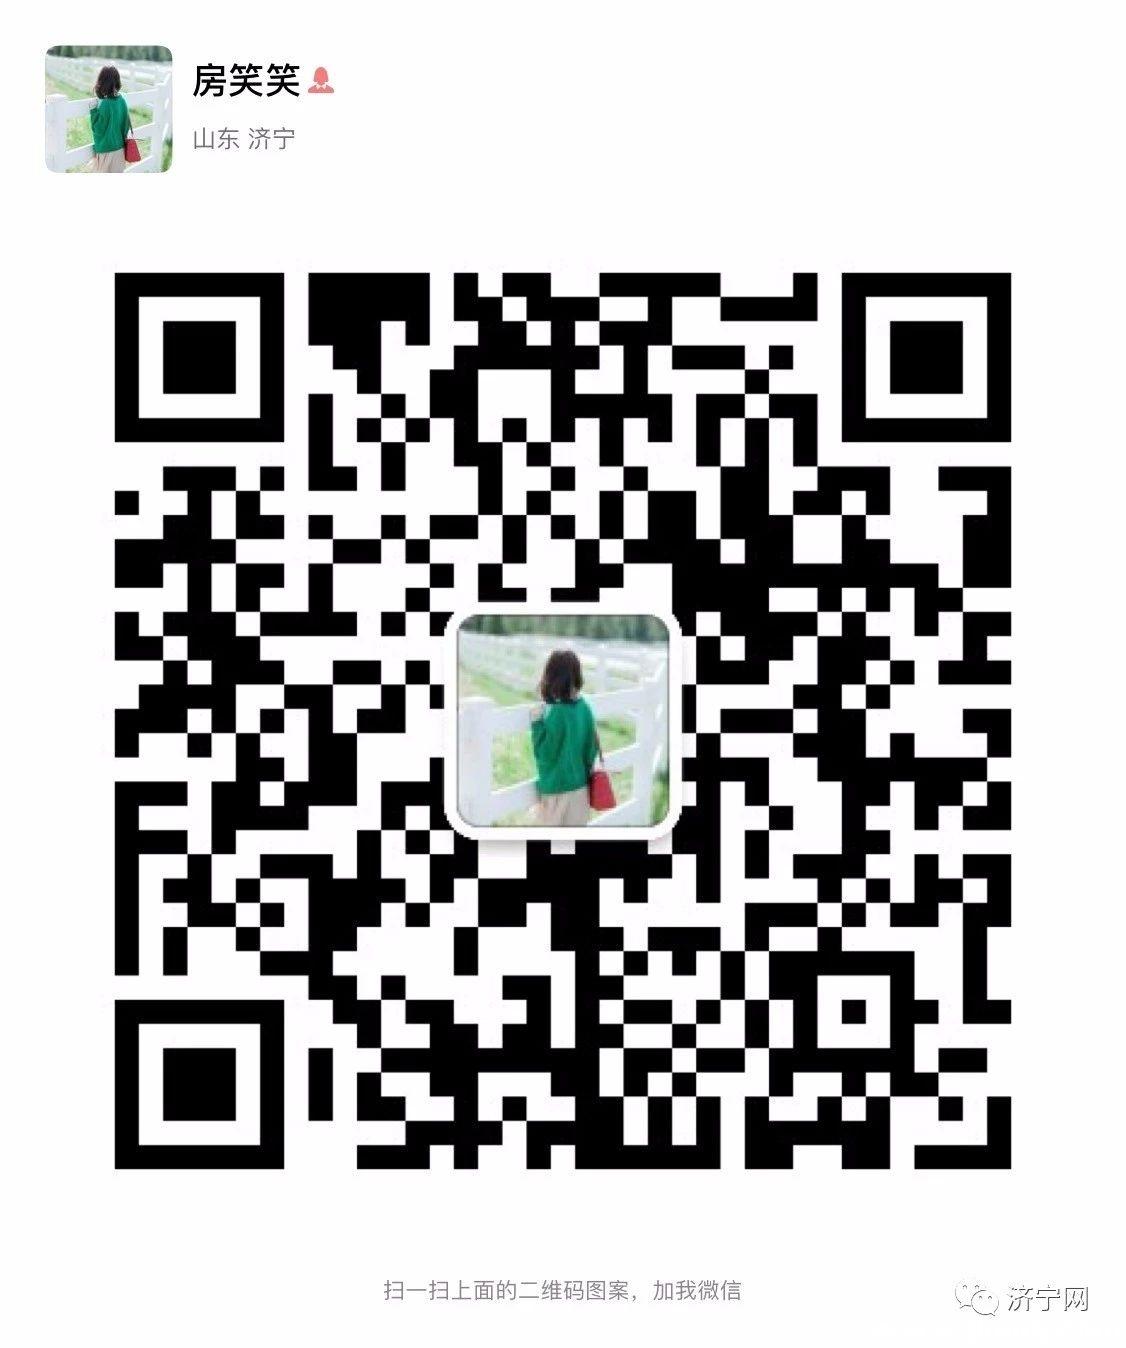 163324o4ex57eijmxm4zu6.jpg